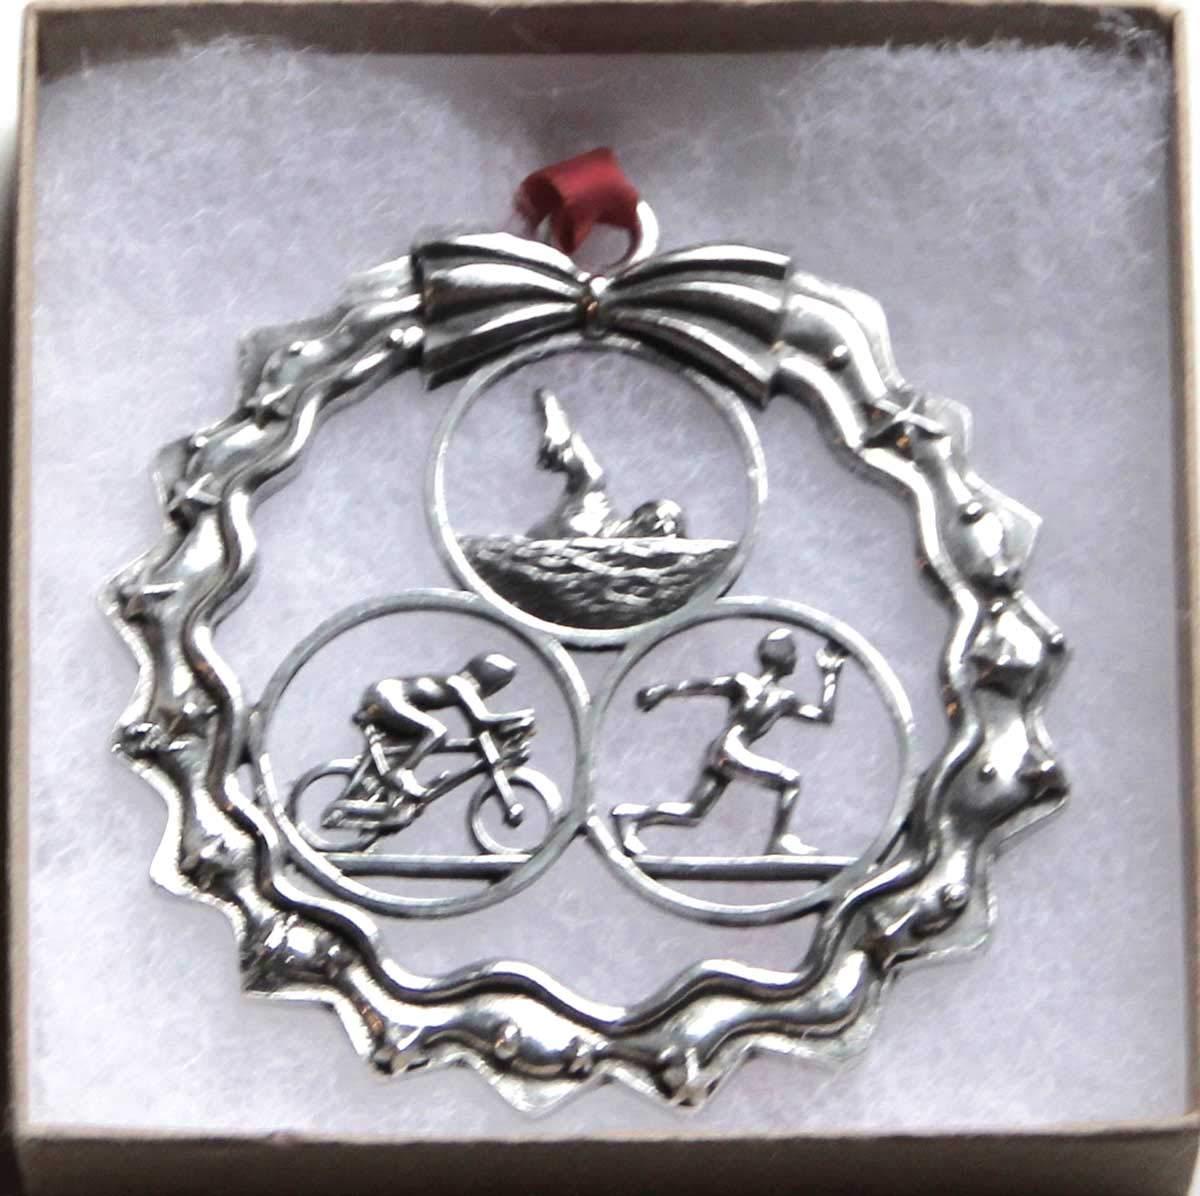 Dana Paige Designs Male Triathlon Ornament in Wreath - Handmade Triathlon Ornaments - Unique Holiday Triathlon Gift